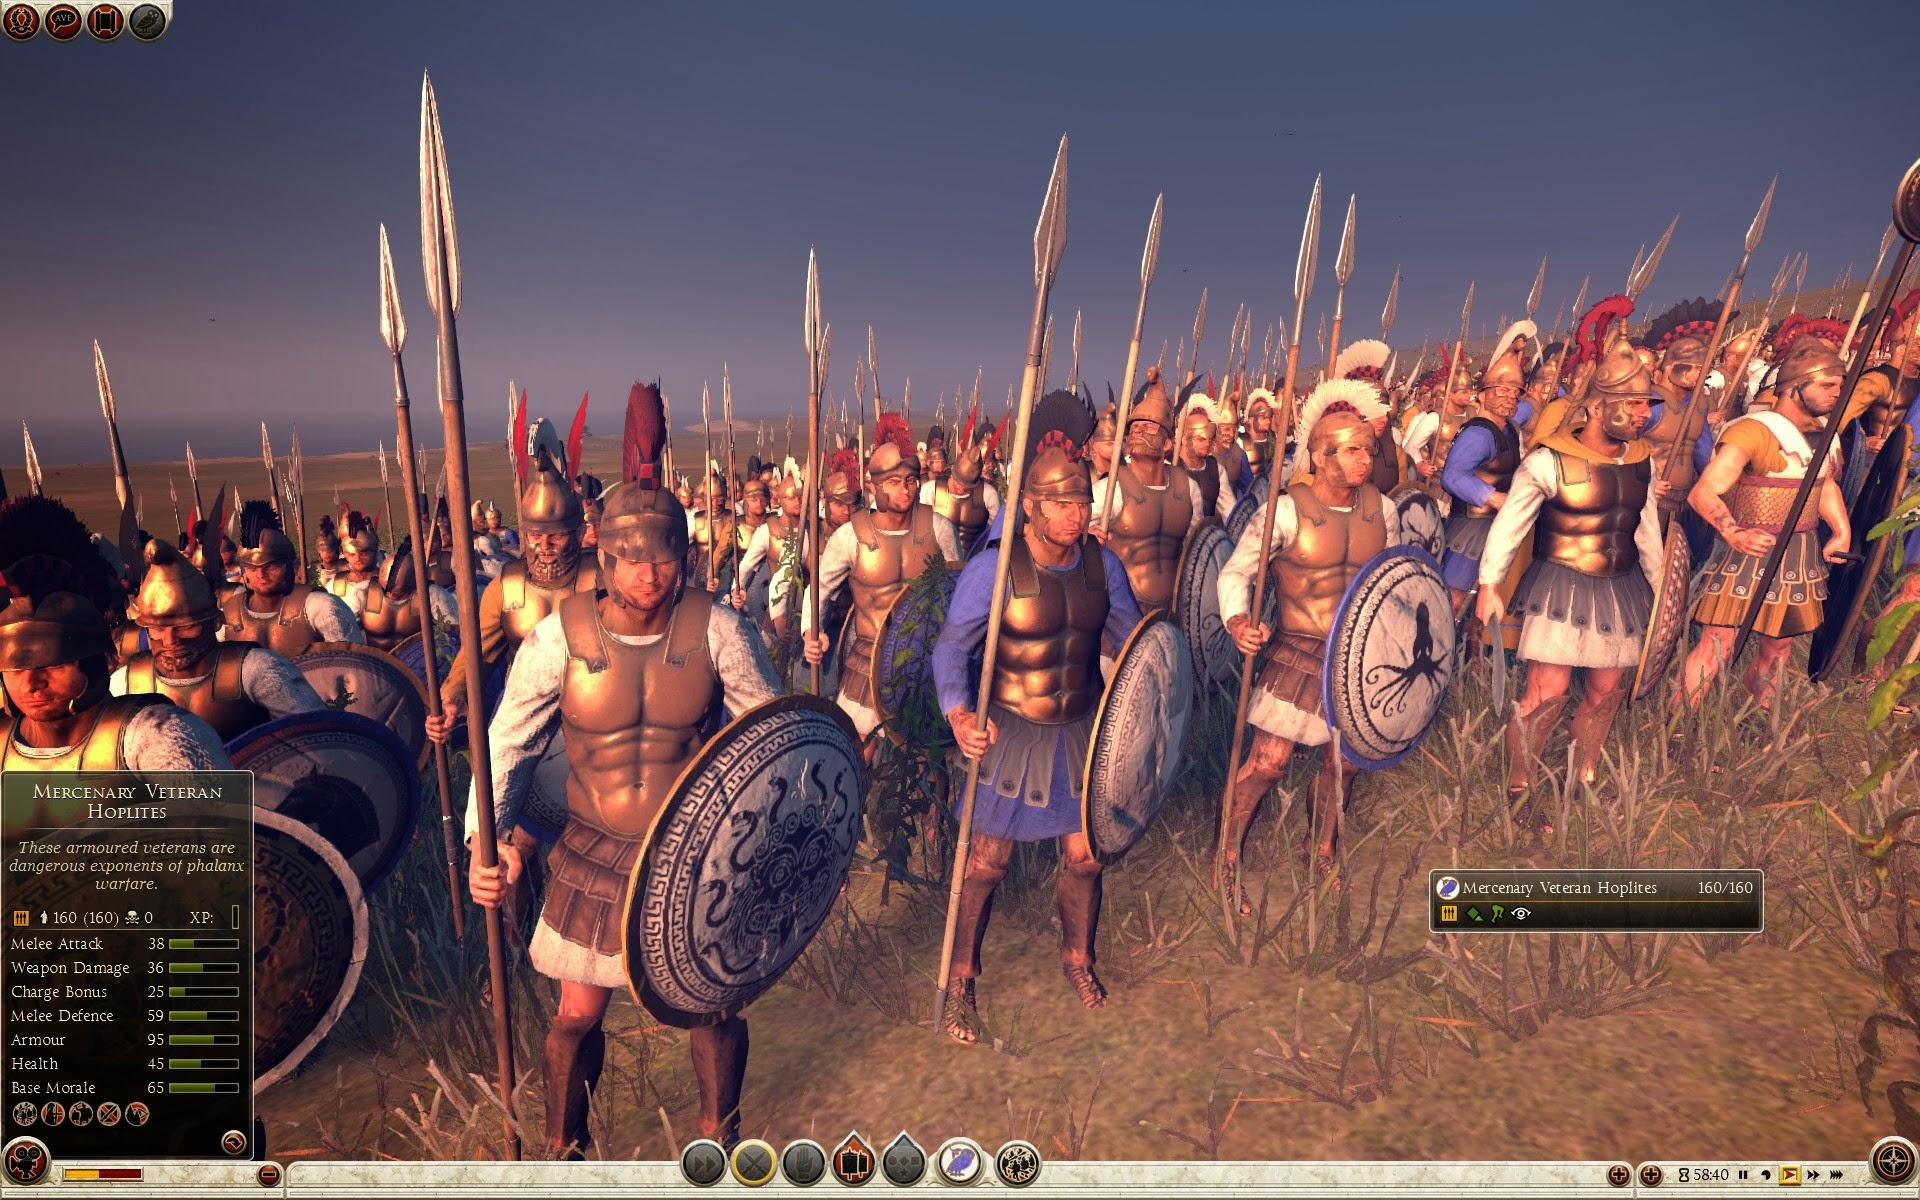 Mercenary Veteran Hoplites